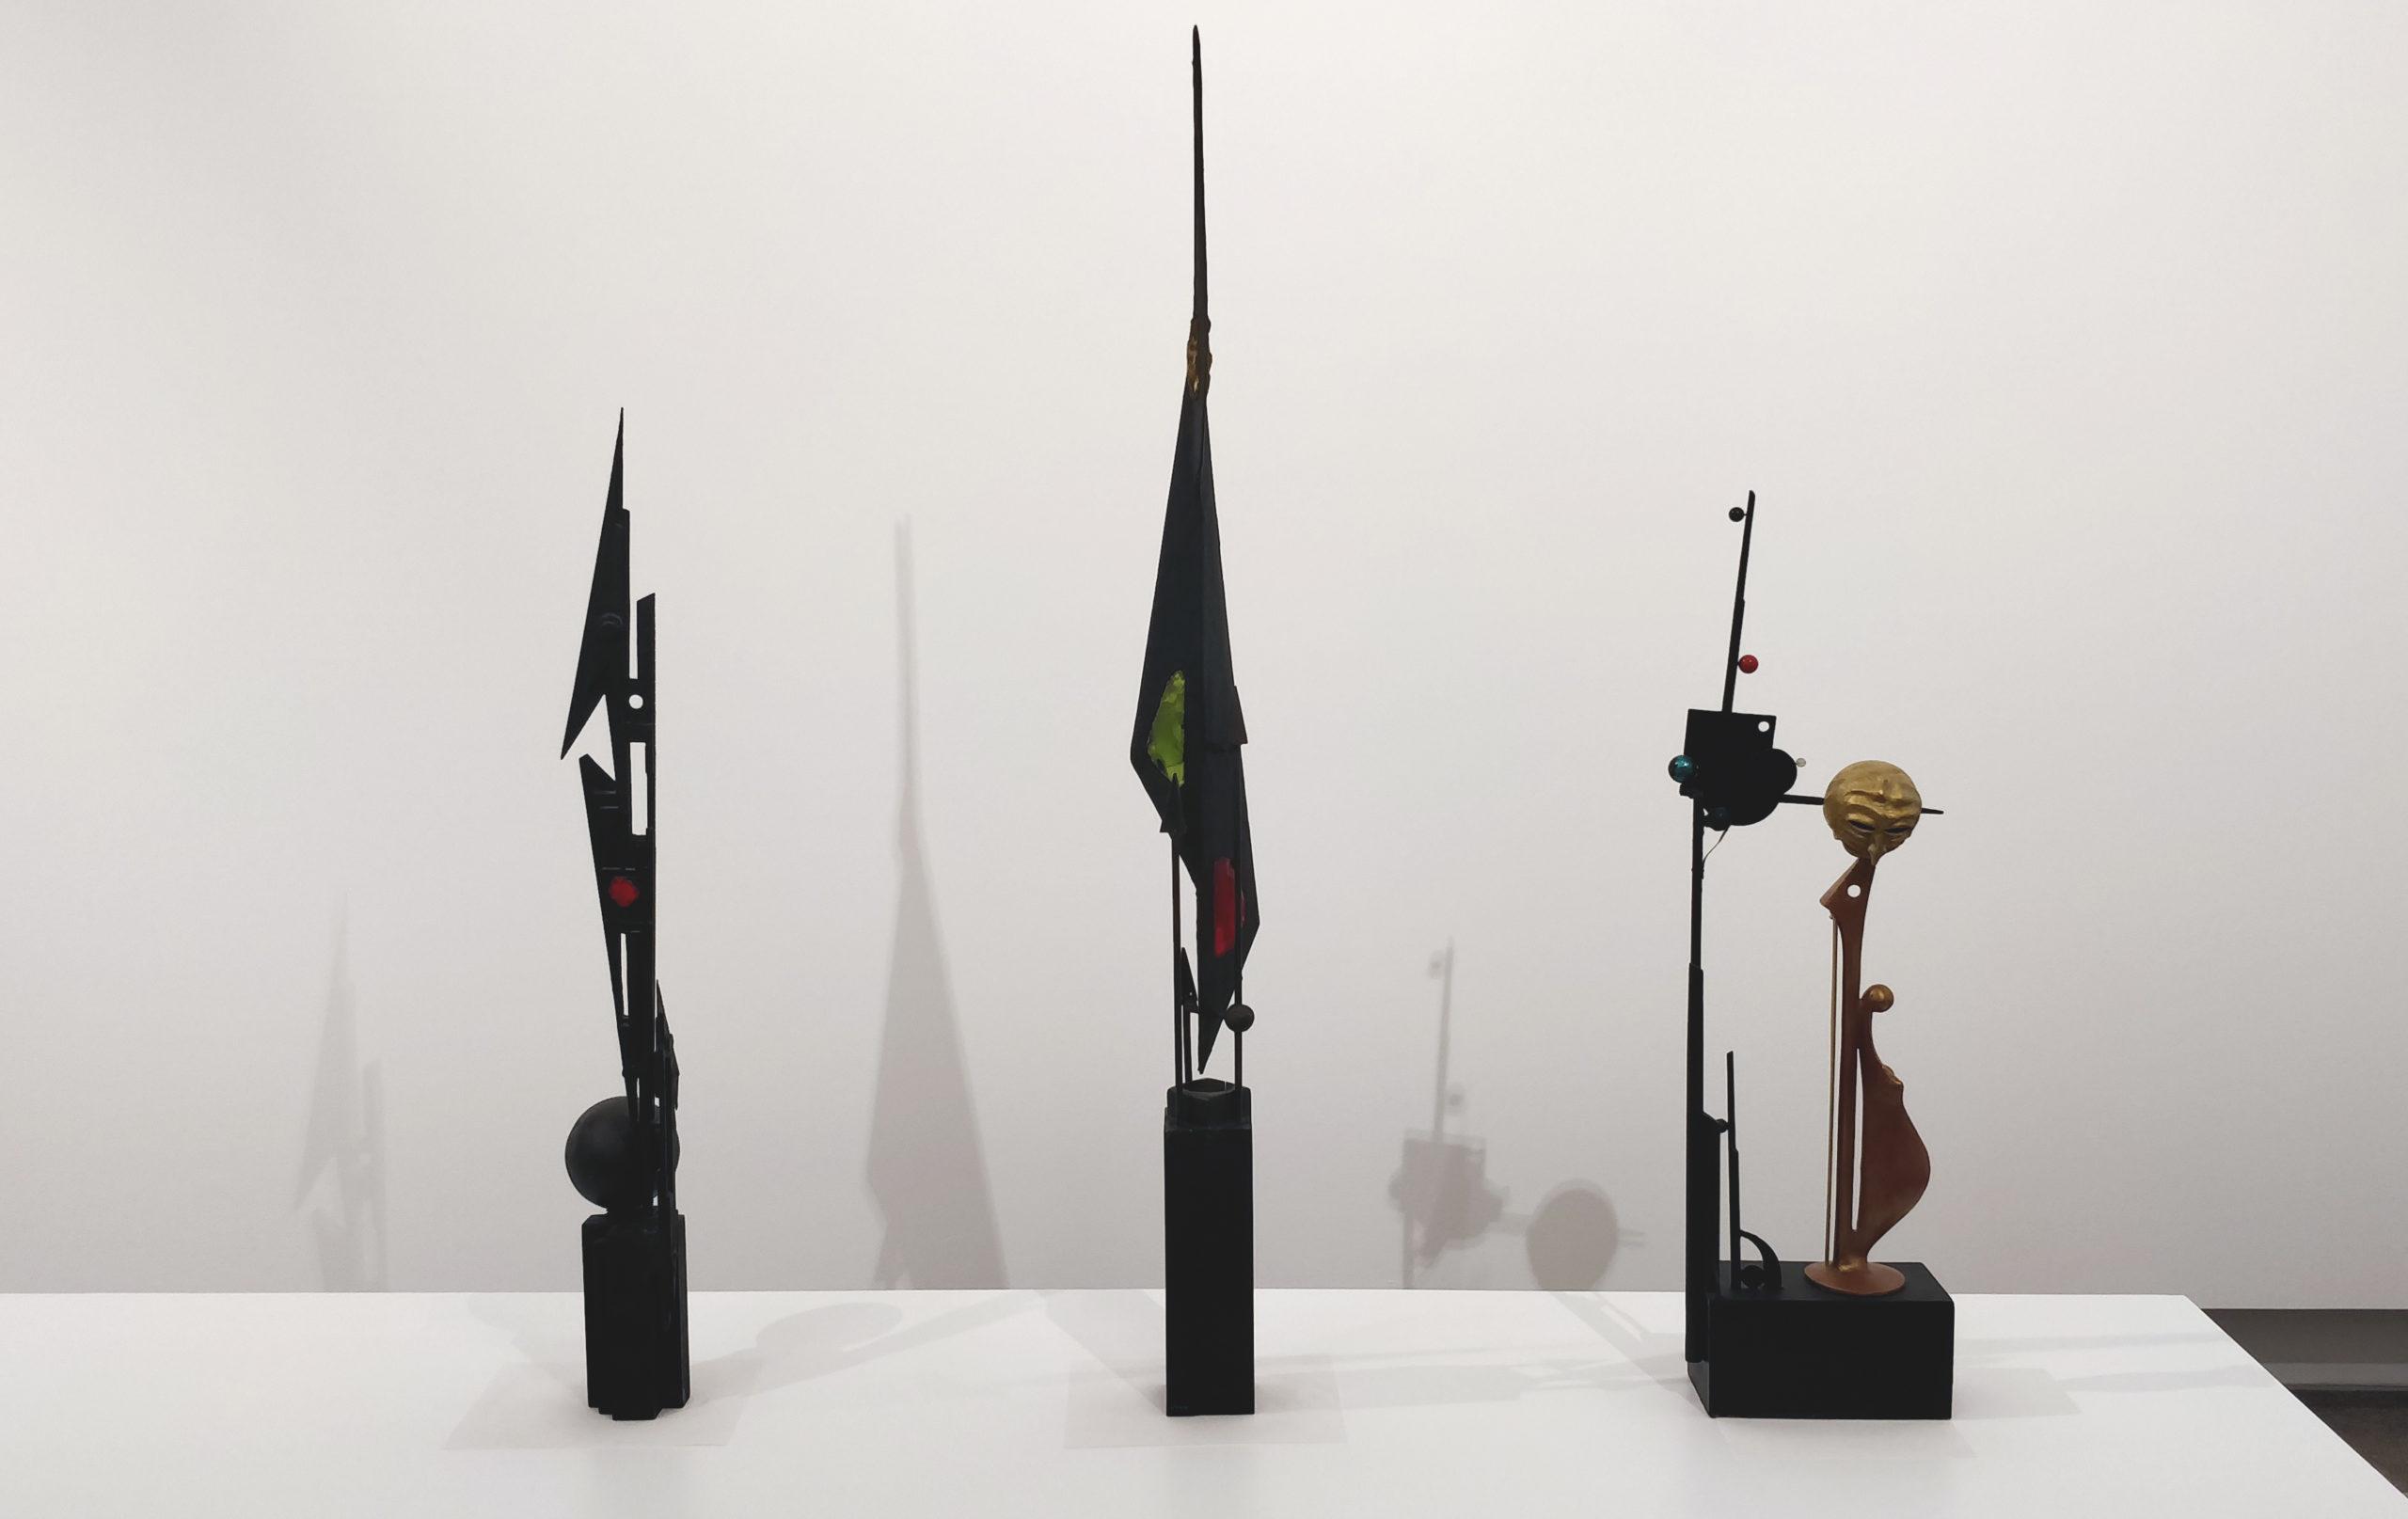 Robert Rocca : œuvres monumentales (maquettes). Photo : Christophe Colrat